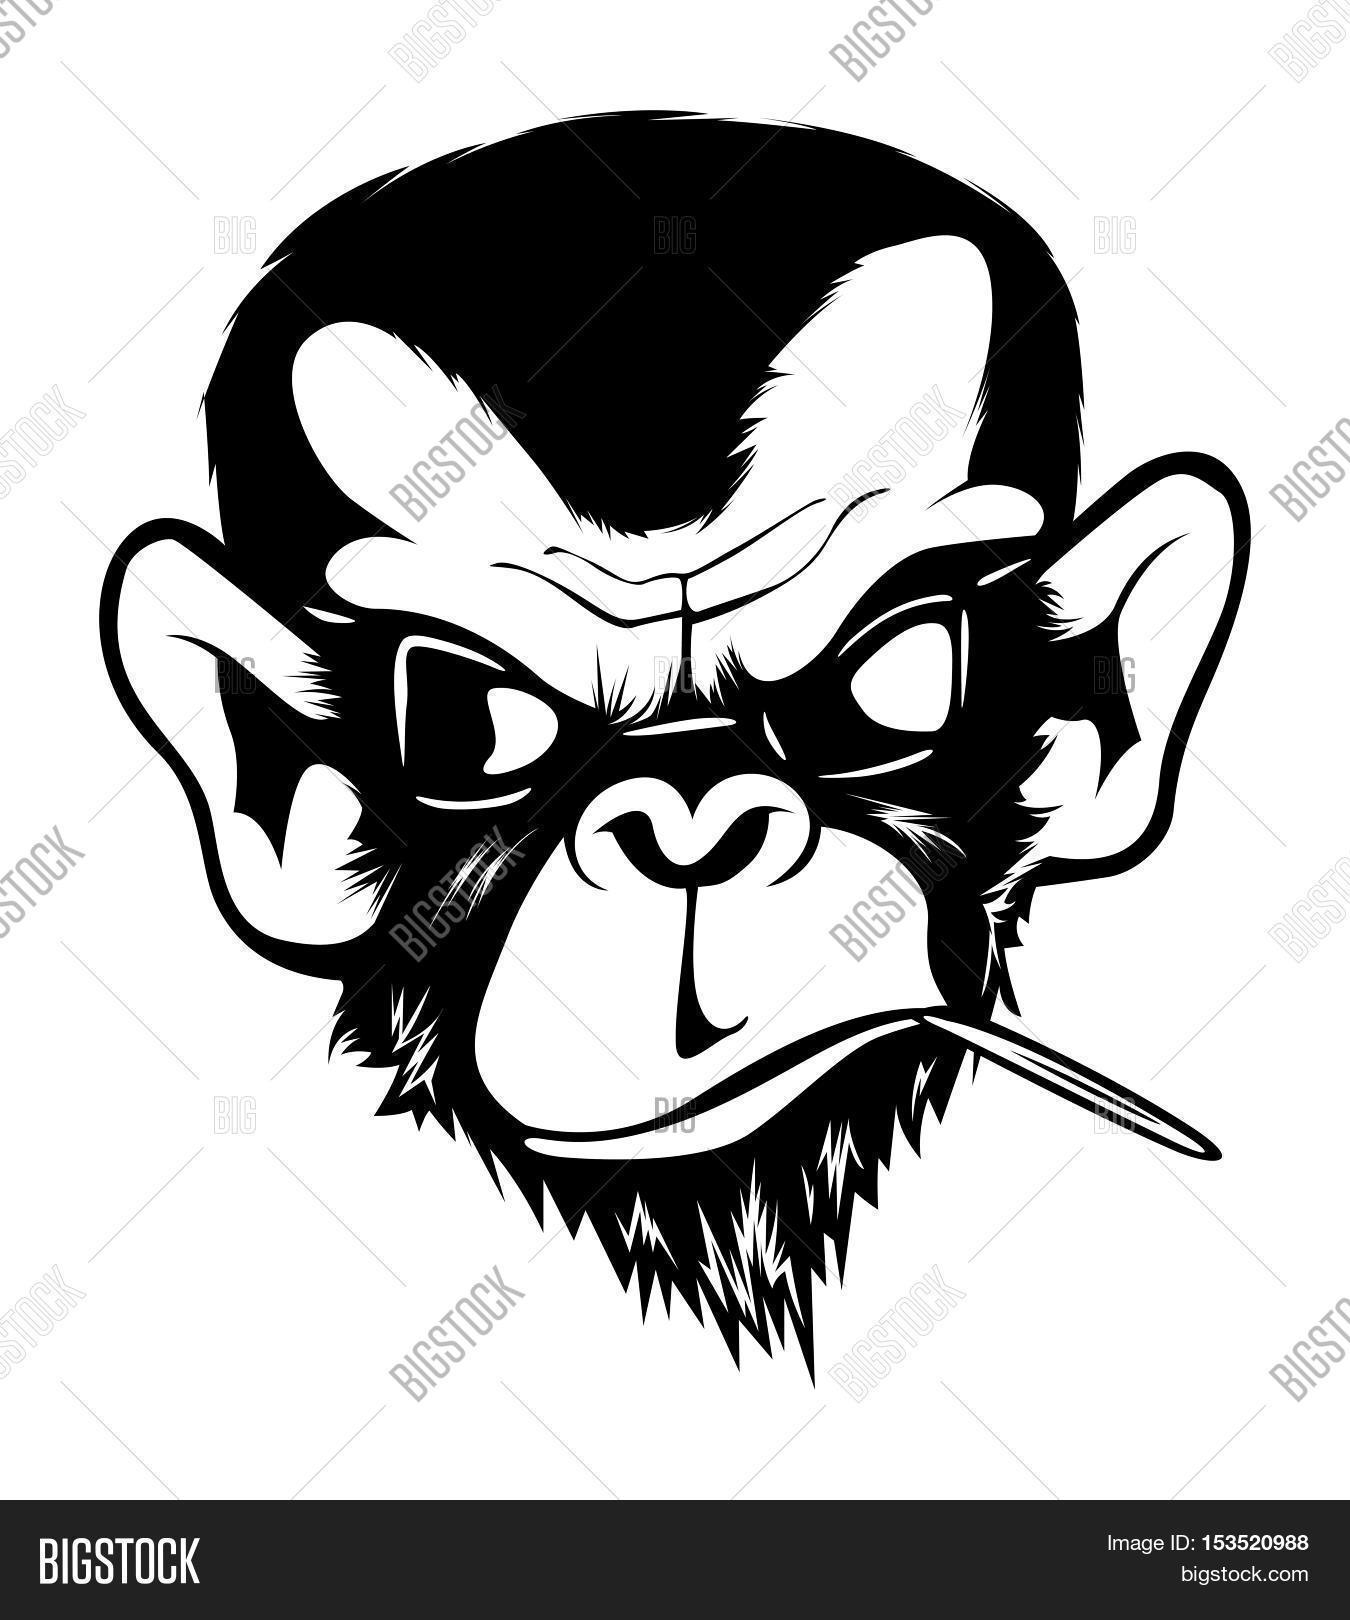 1350x1620 Mad Angry Bad Chimp Ape Monkey Image Amp Photo Bigstock